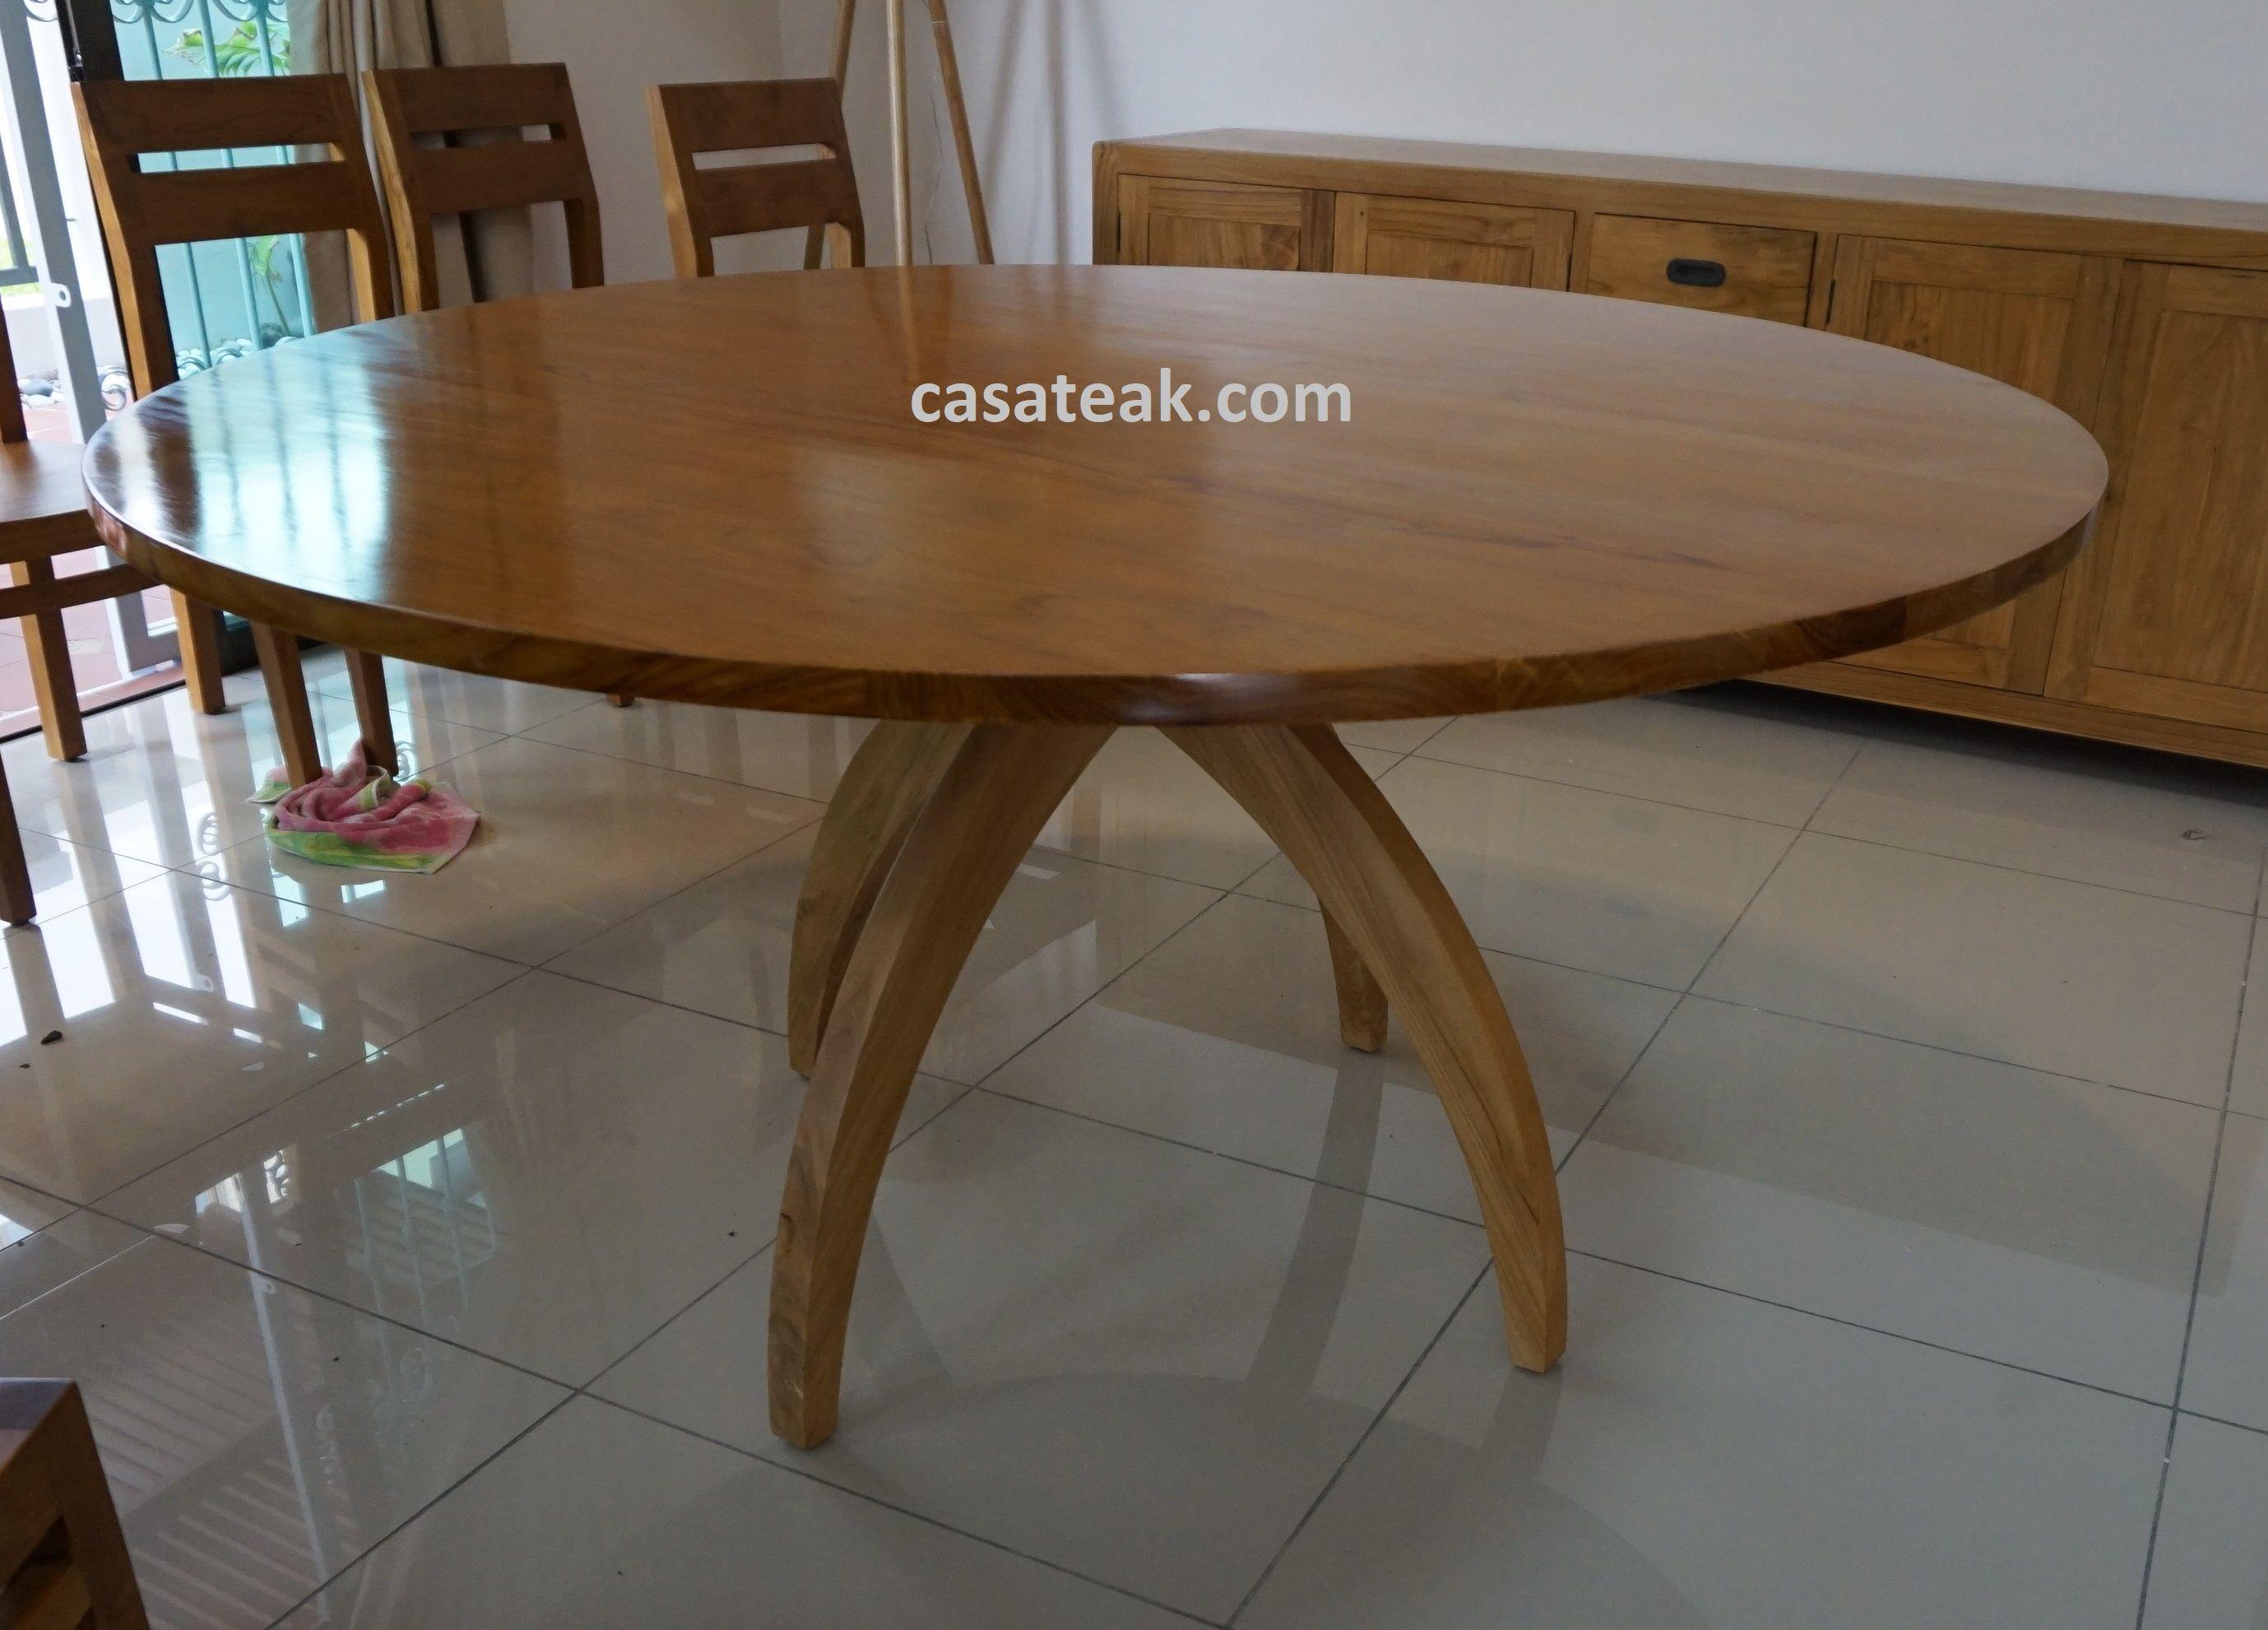 Teak Furniture Malaysia Teak Wood Furniture Shop Selangor Malaysia Teak Wood Furniture Wood Furniture Store Teak Furniture